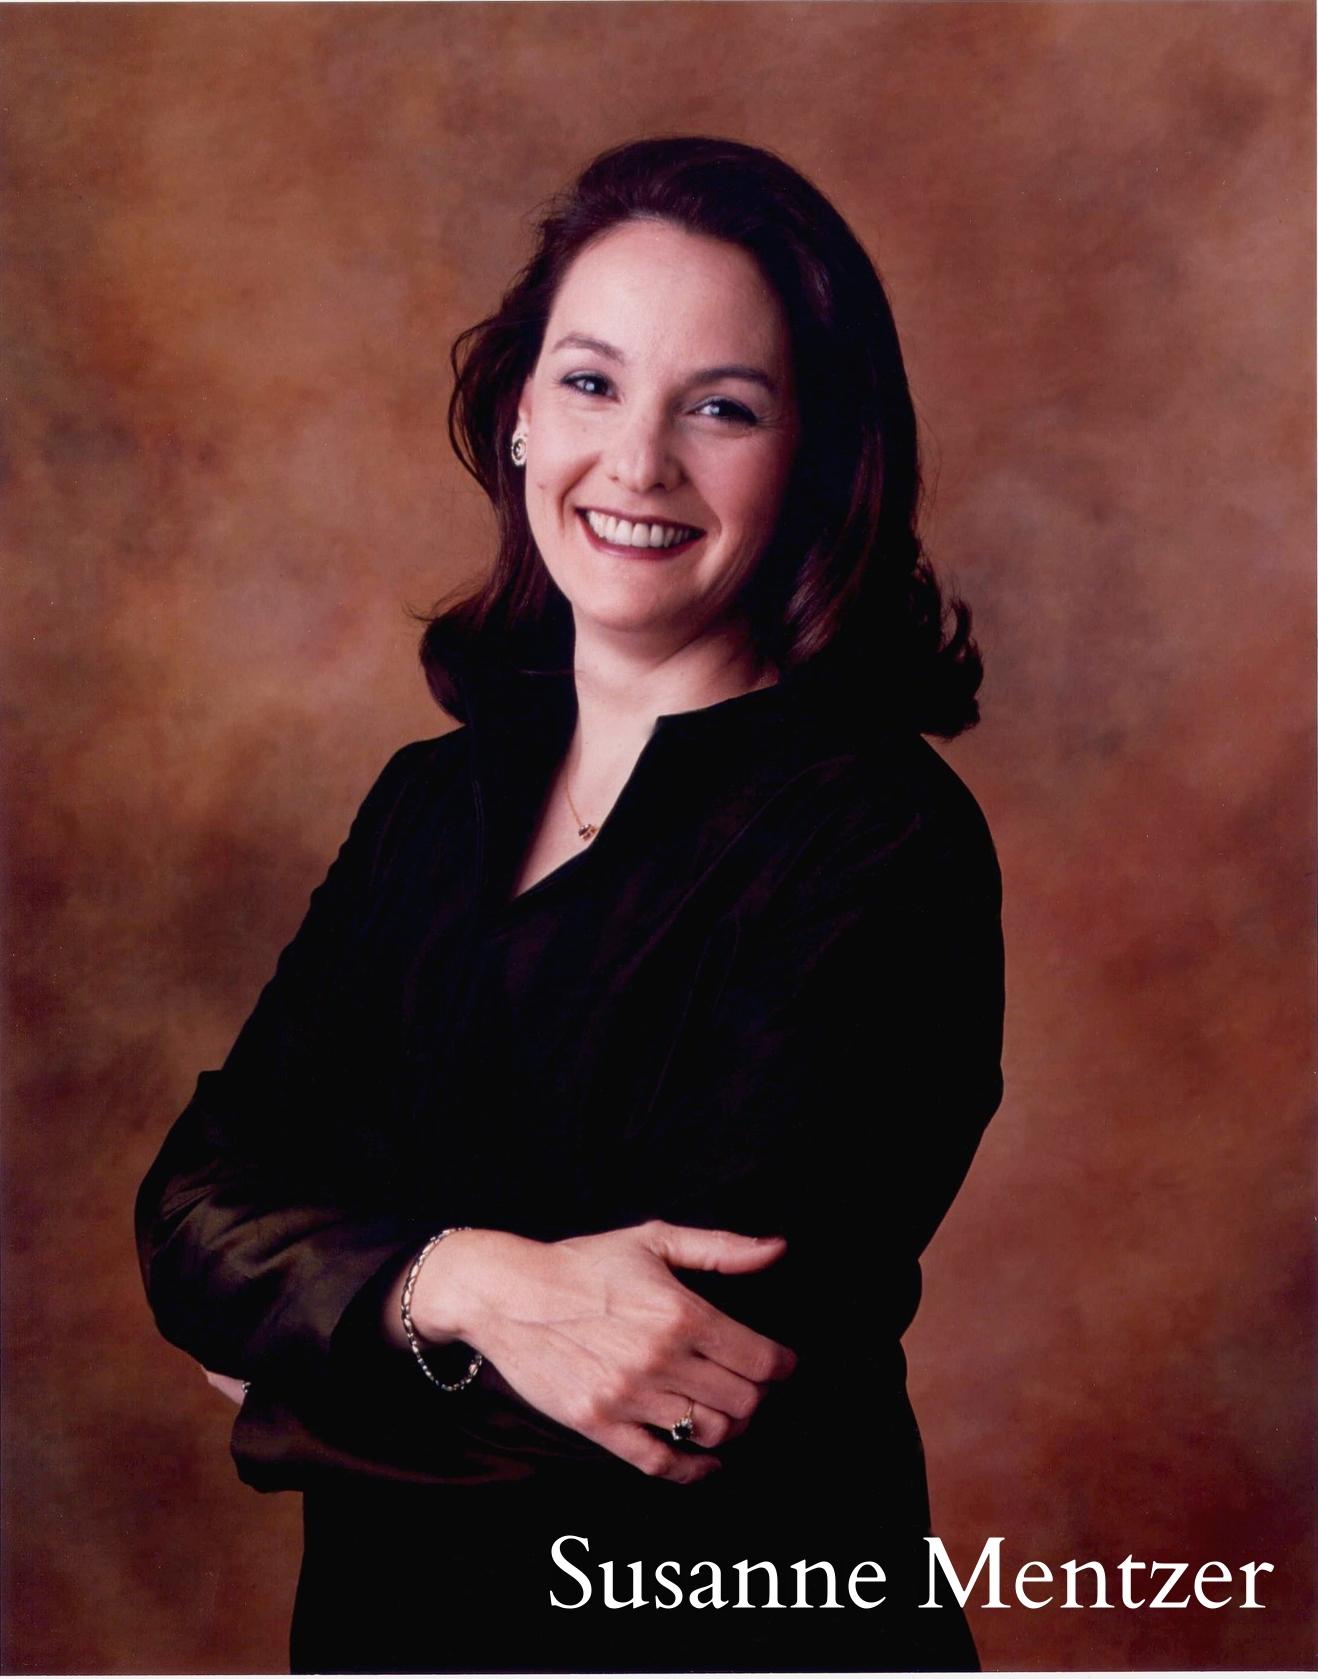 Susanne Mentzer | mezzo-soprano